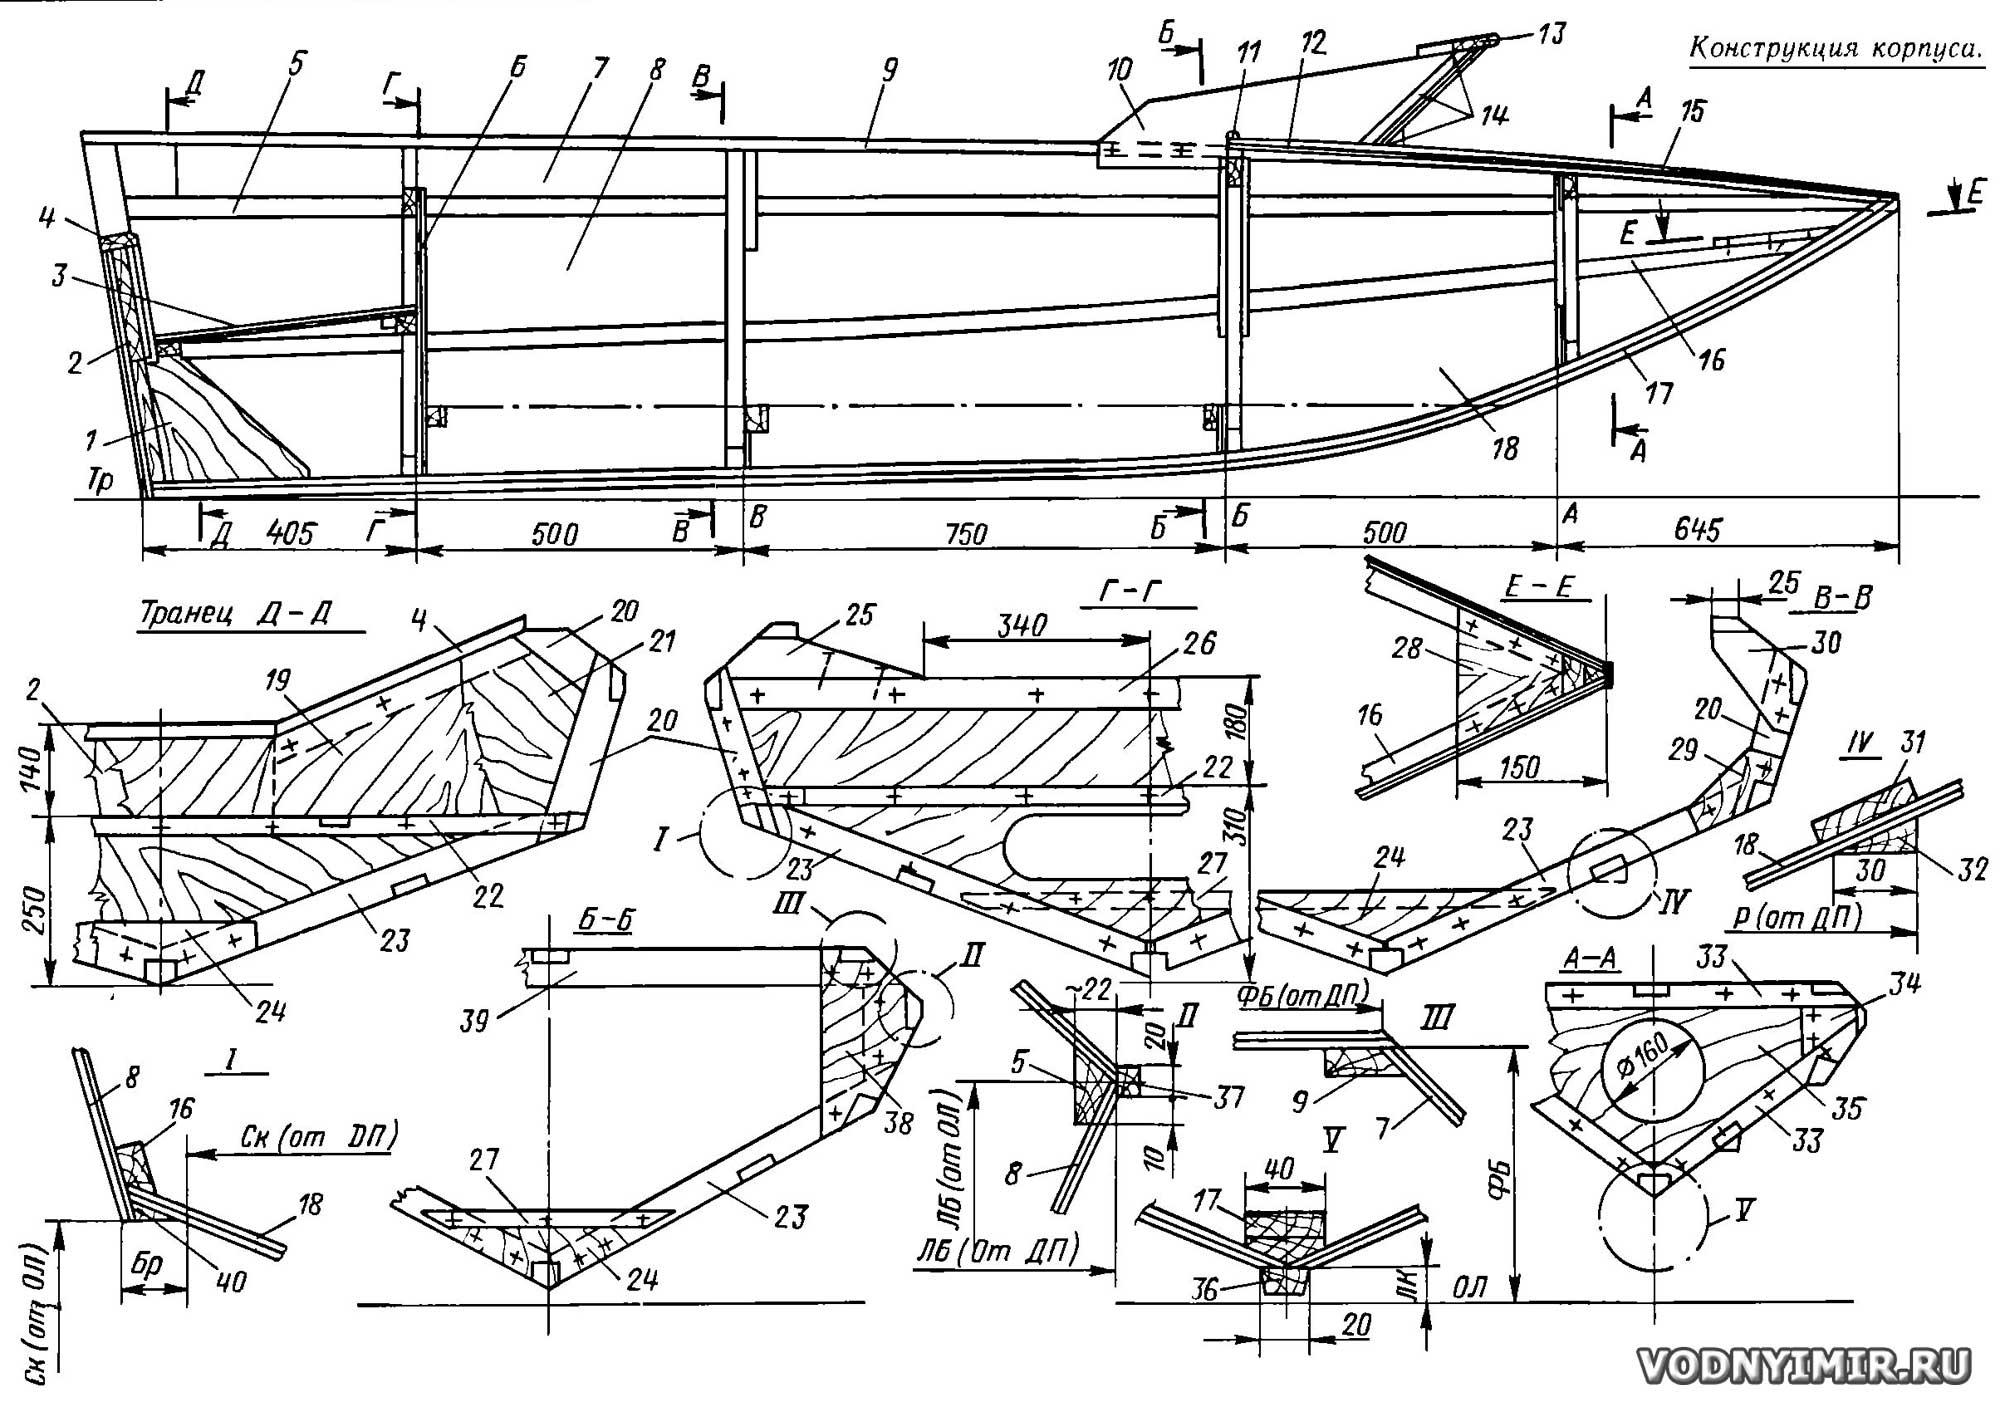 Болотоход для лодки своими руками чертежи 37